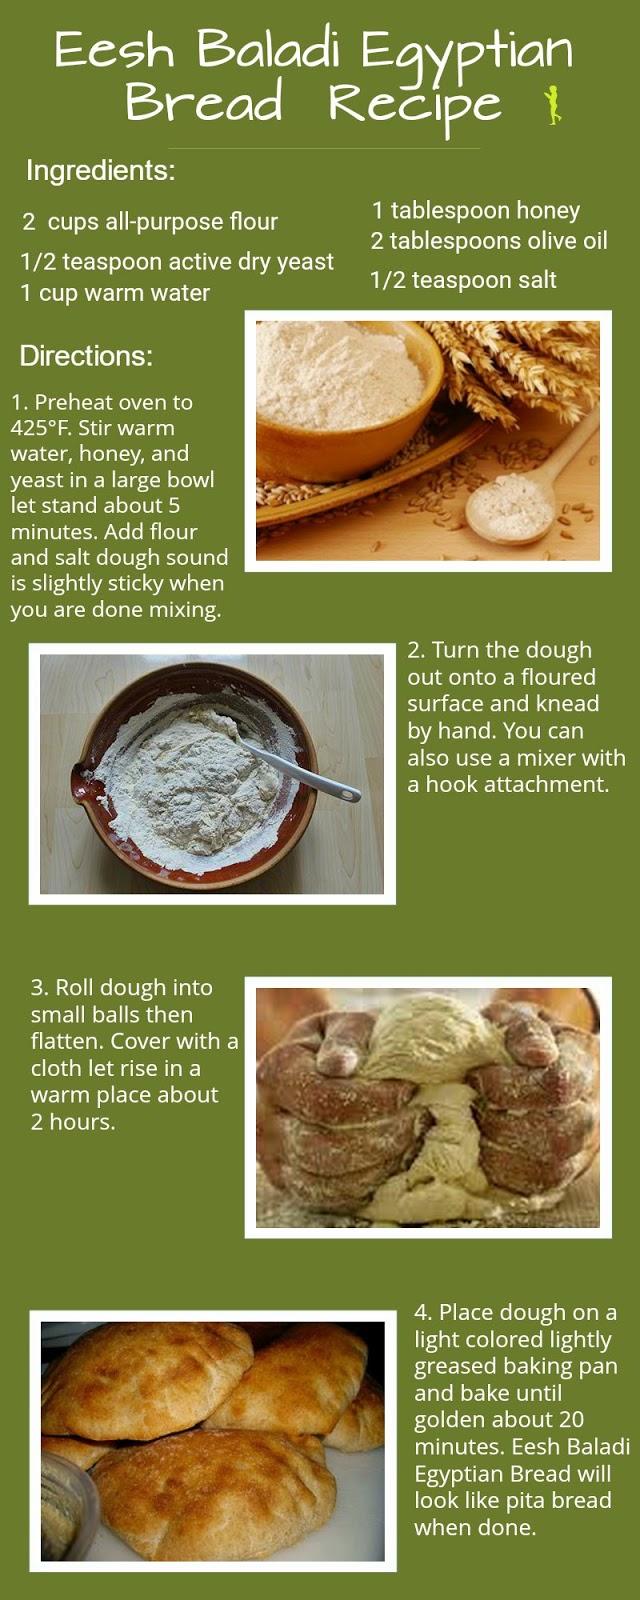 Simple Eesh Baladi Egyptian Bread Recipe Directions